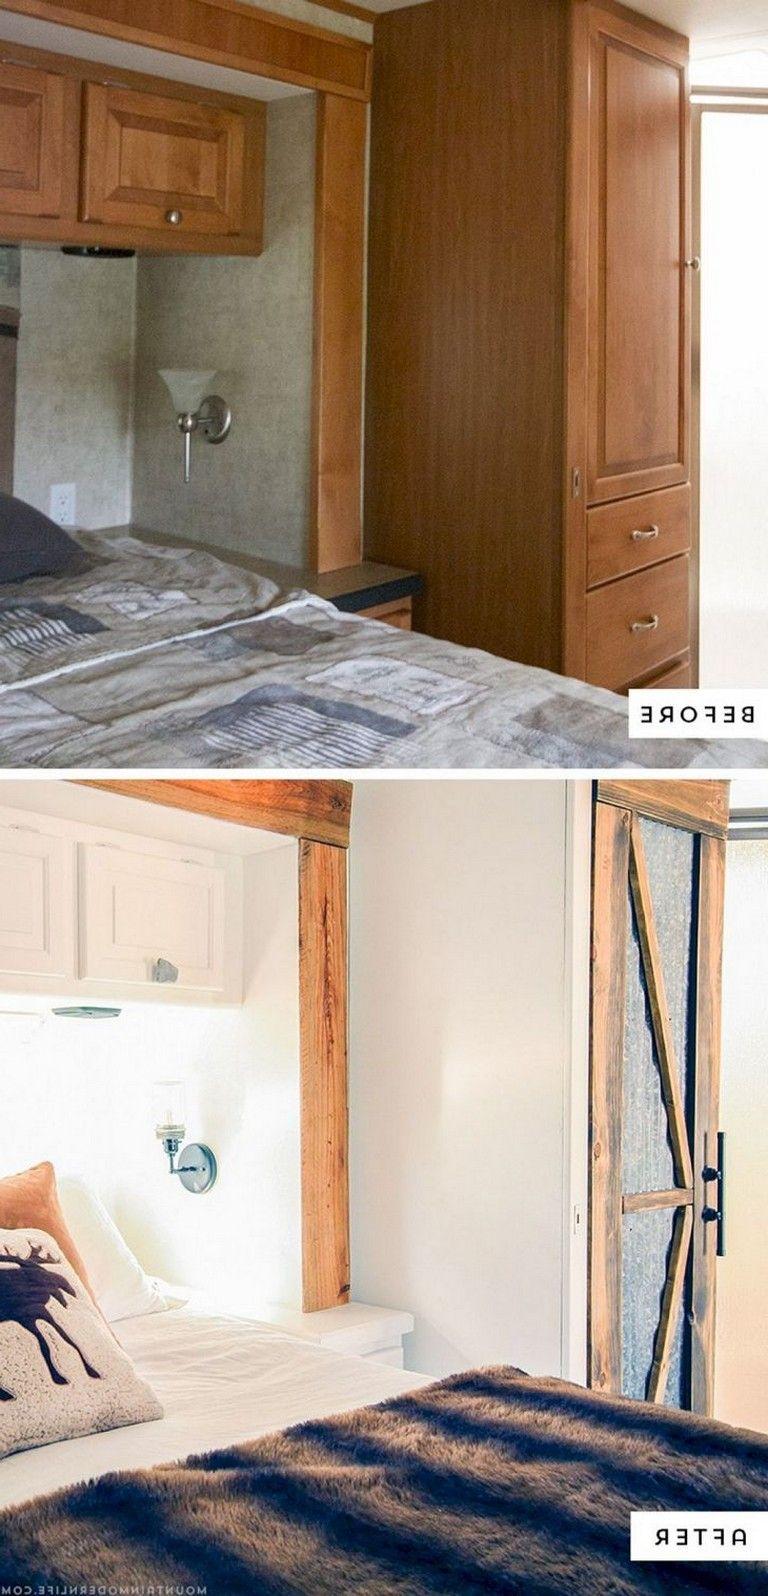 8 amazing rv camper hacks makeover remodel interior ideas rh pinterest com